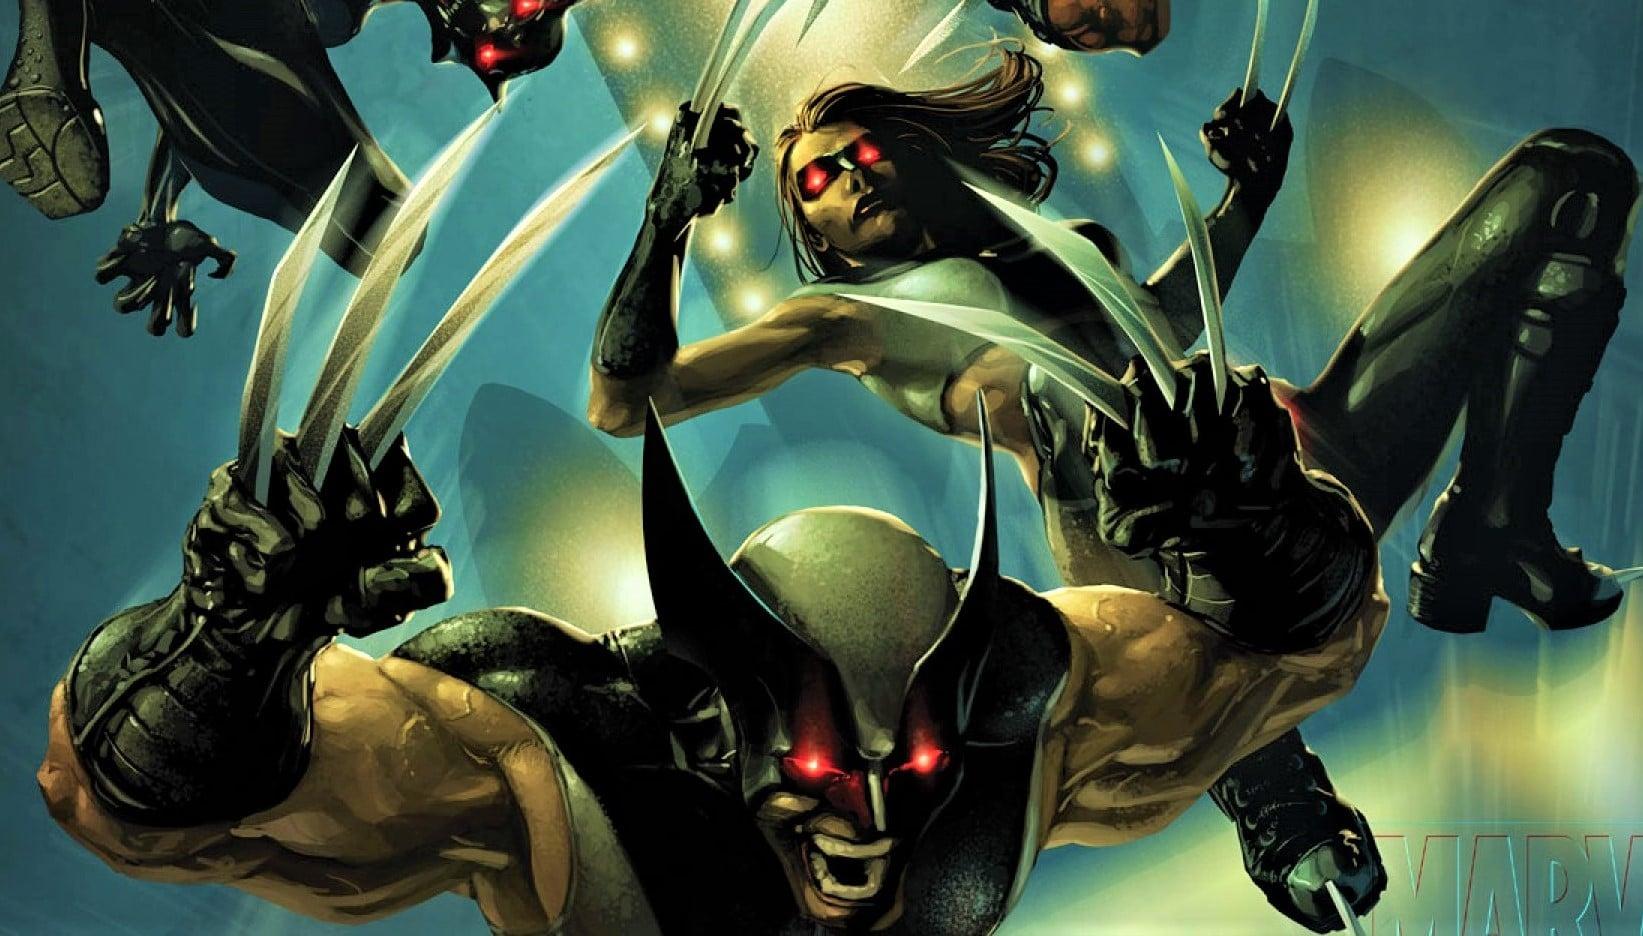 Marvel Reveals Wolverine NEW Black Costume & Marvel Reveals Wolverine NEW Black Costume - Animated Times